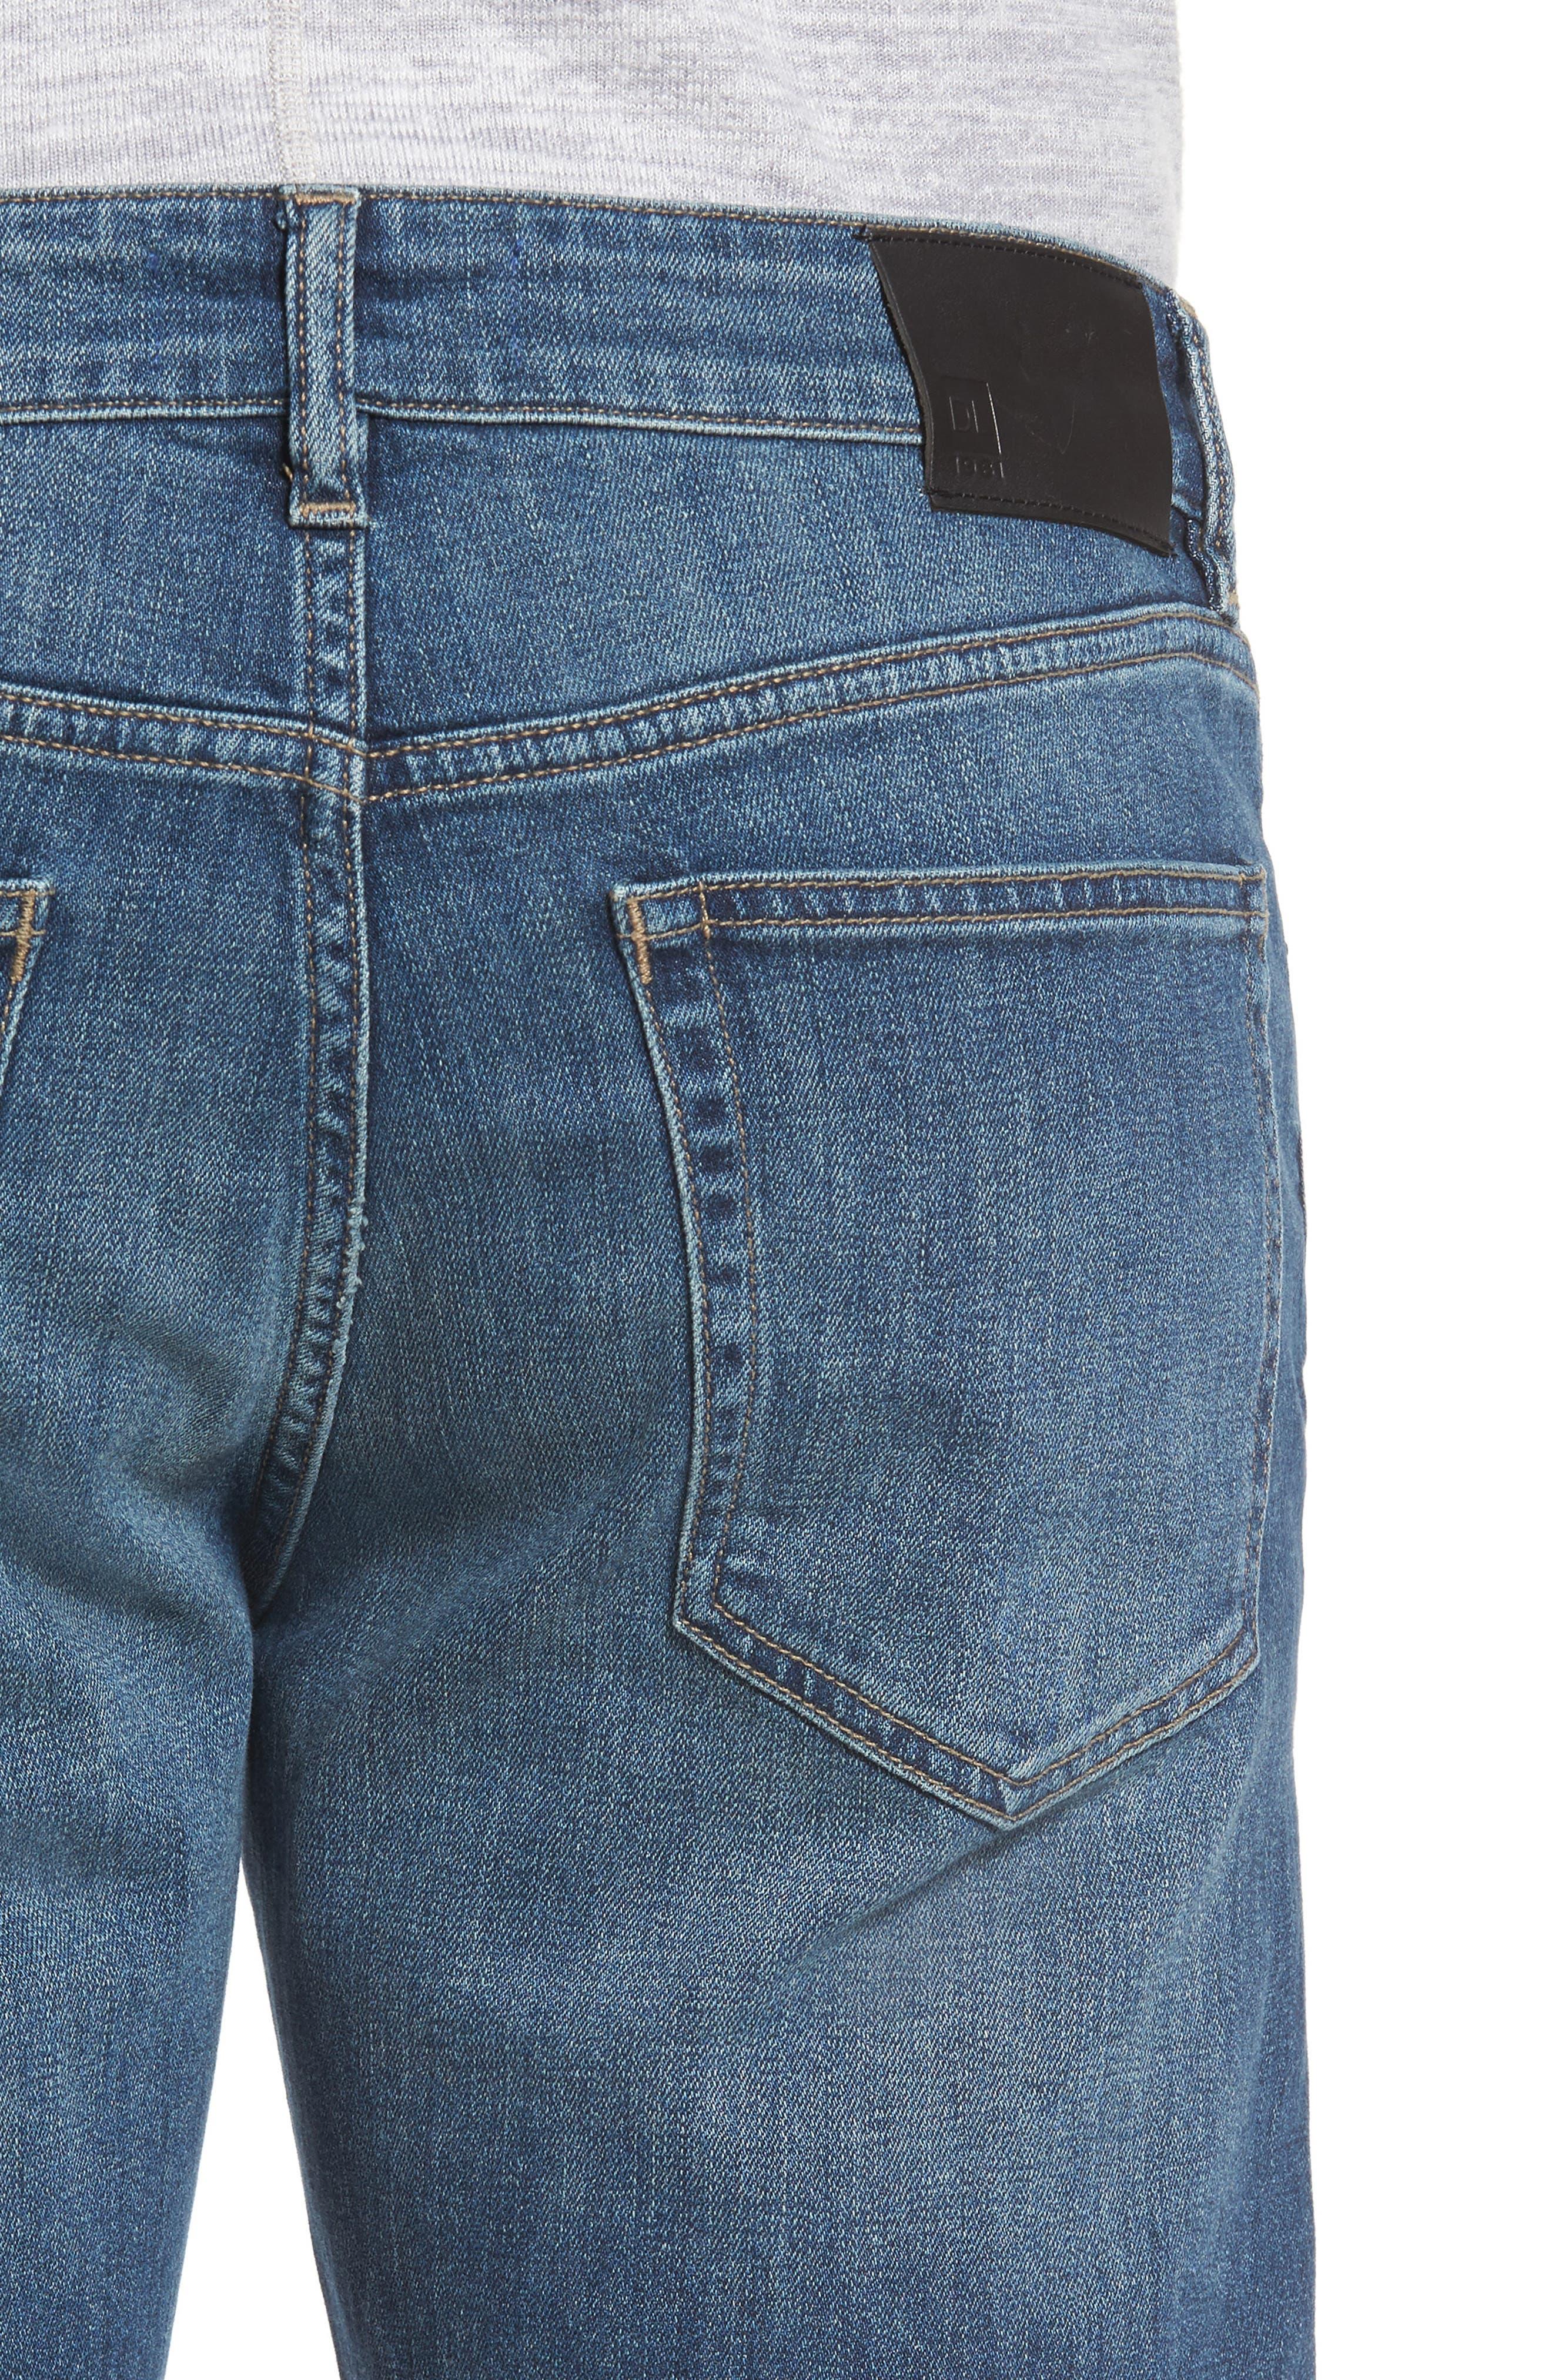 Avery Slim Straight Leg Jeans,                             Alternate thumbnail 4, color,                             Epoxy